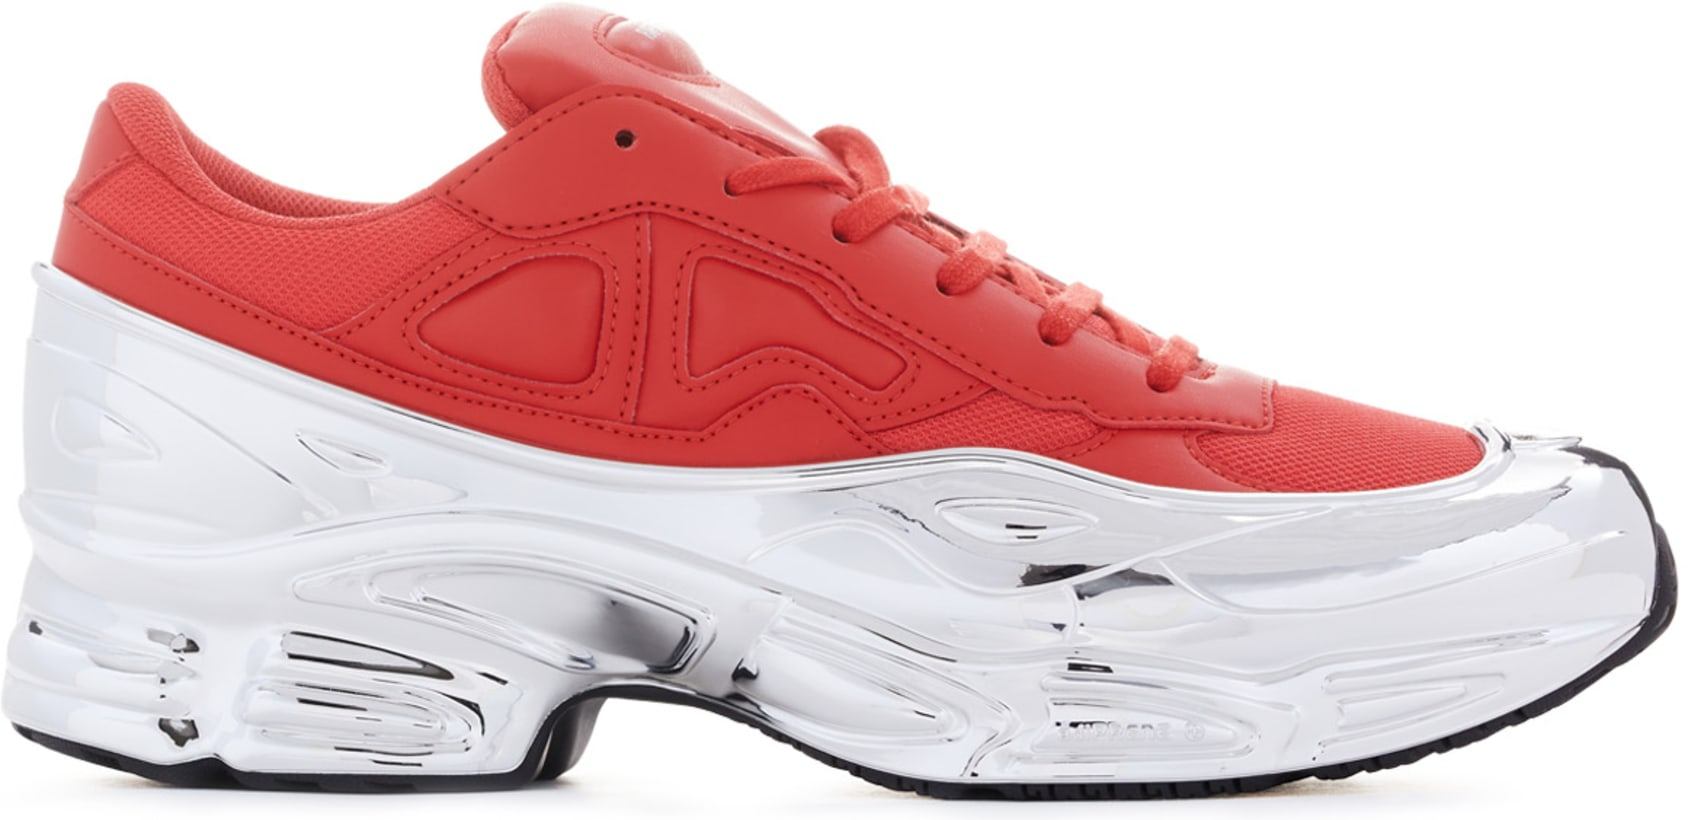 sports shoes 27566 23d57 adidas by Raf Simons - Raf Simons Ozweego - Red/Silver Metallic/Silver  Metallic